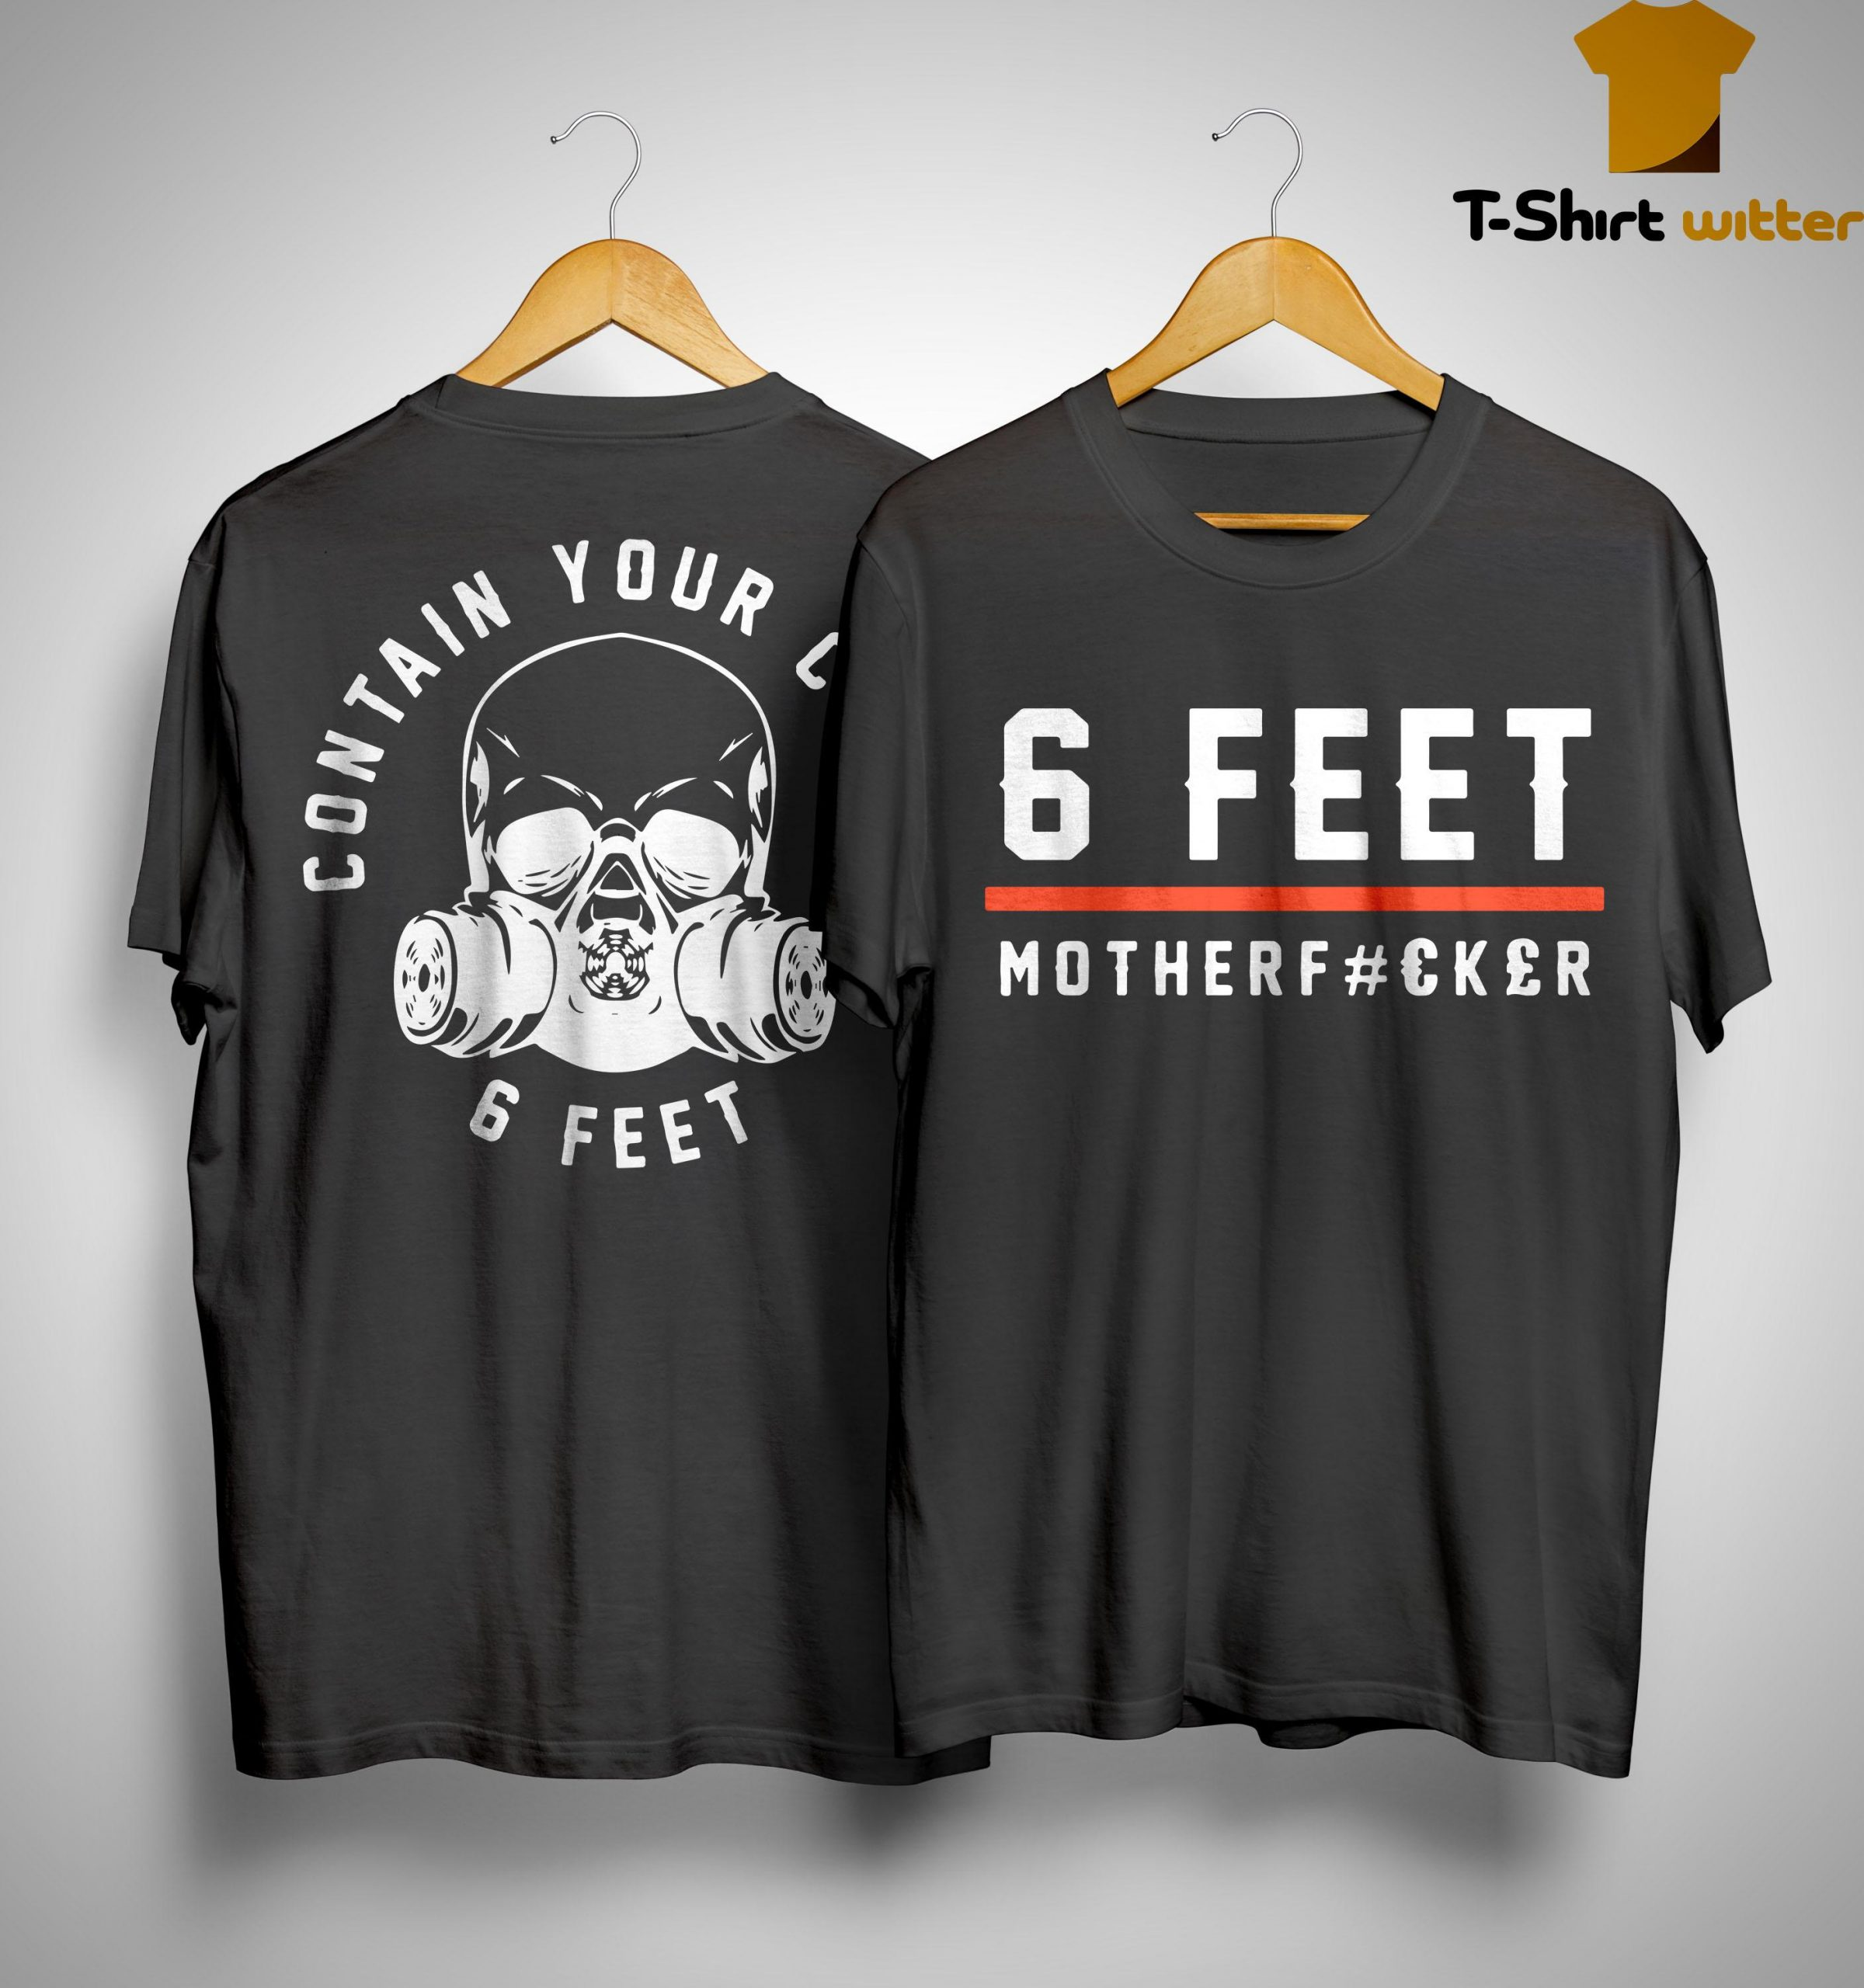 6 Feet Motherfucker Shirt